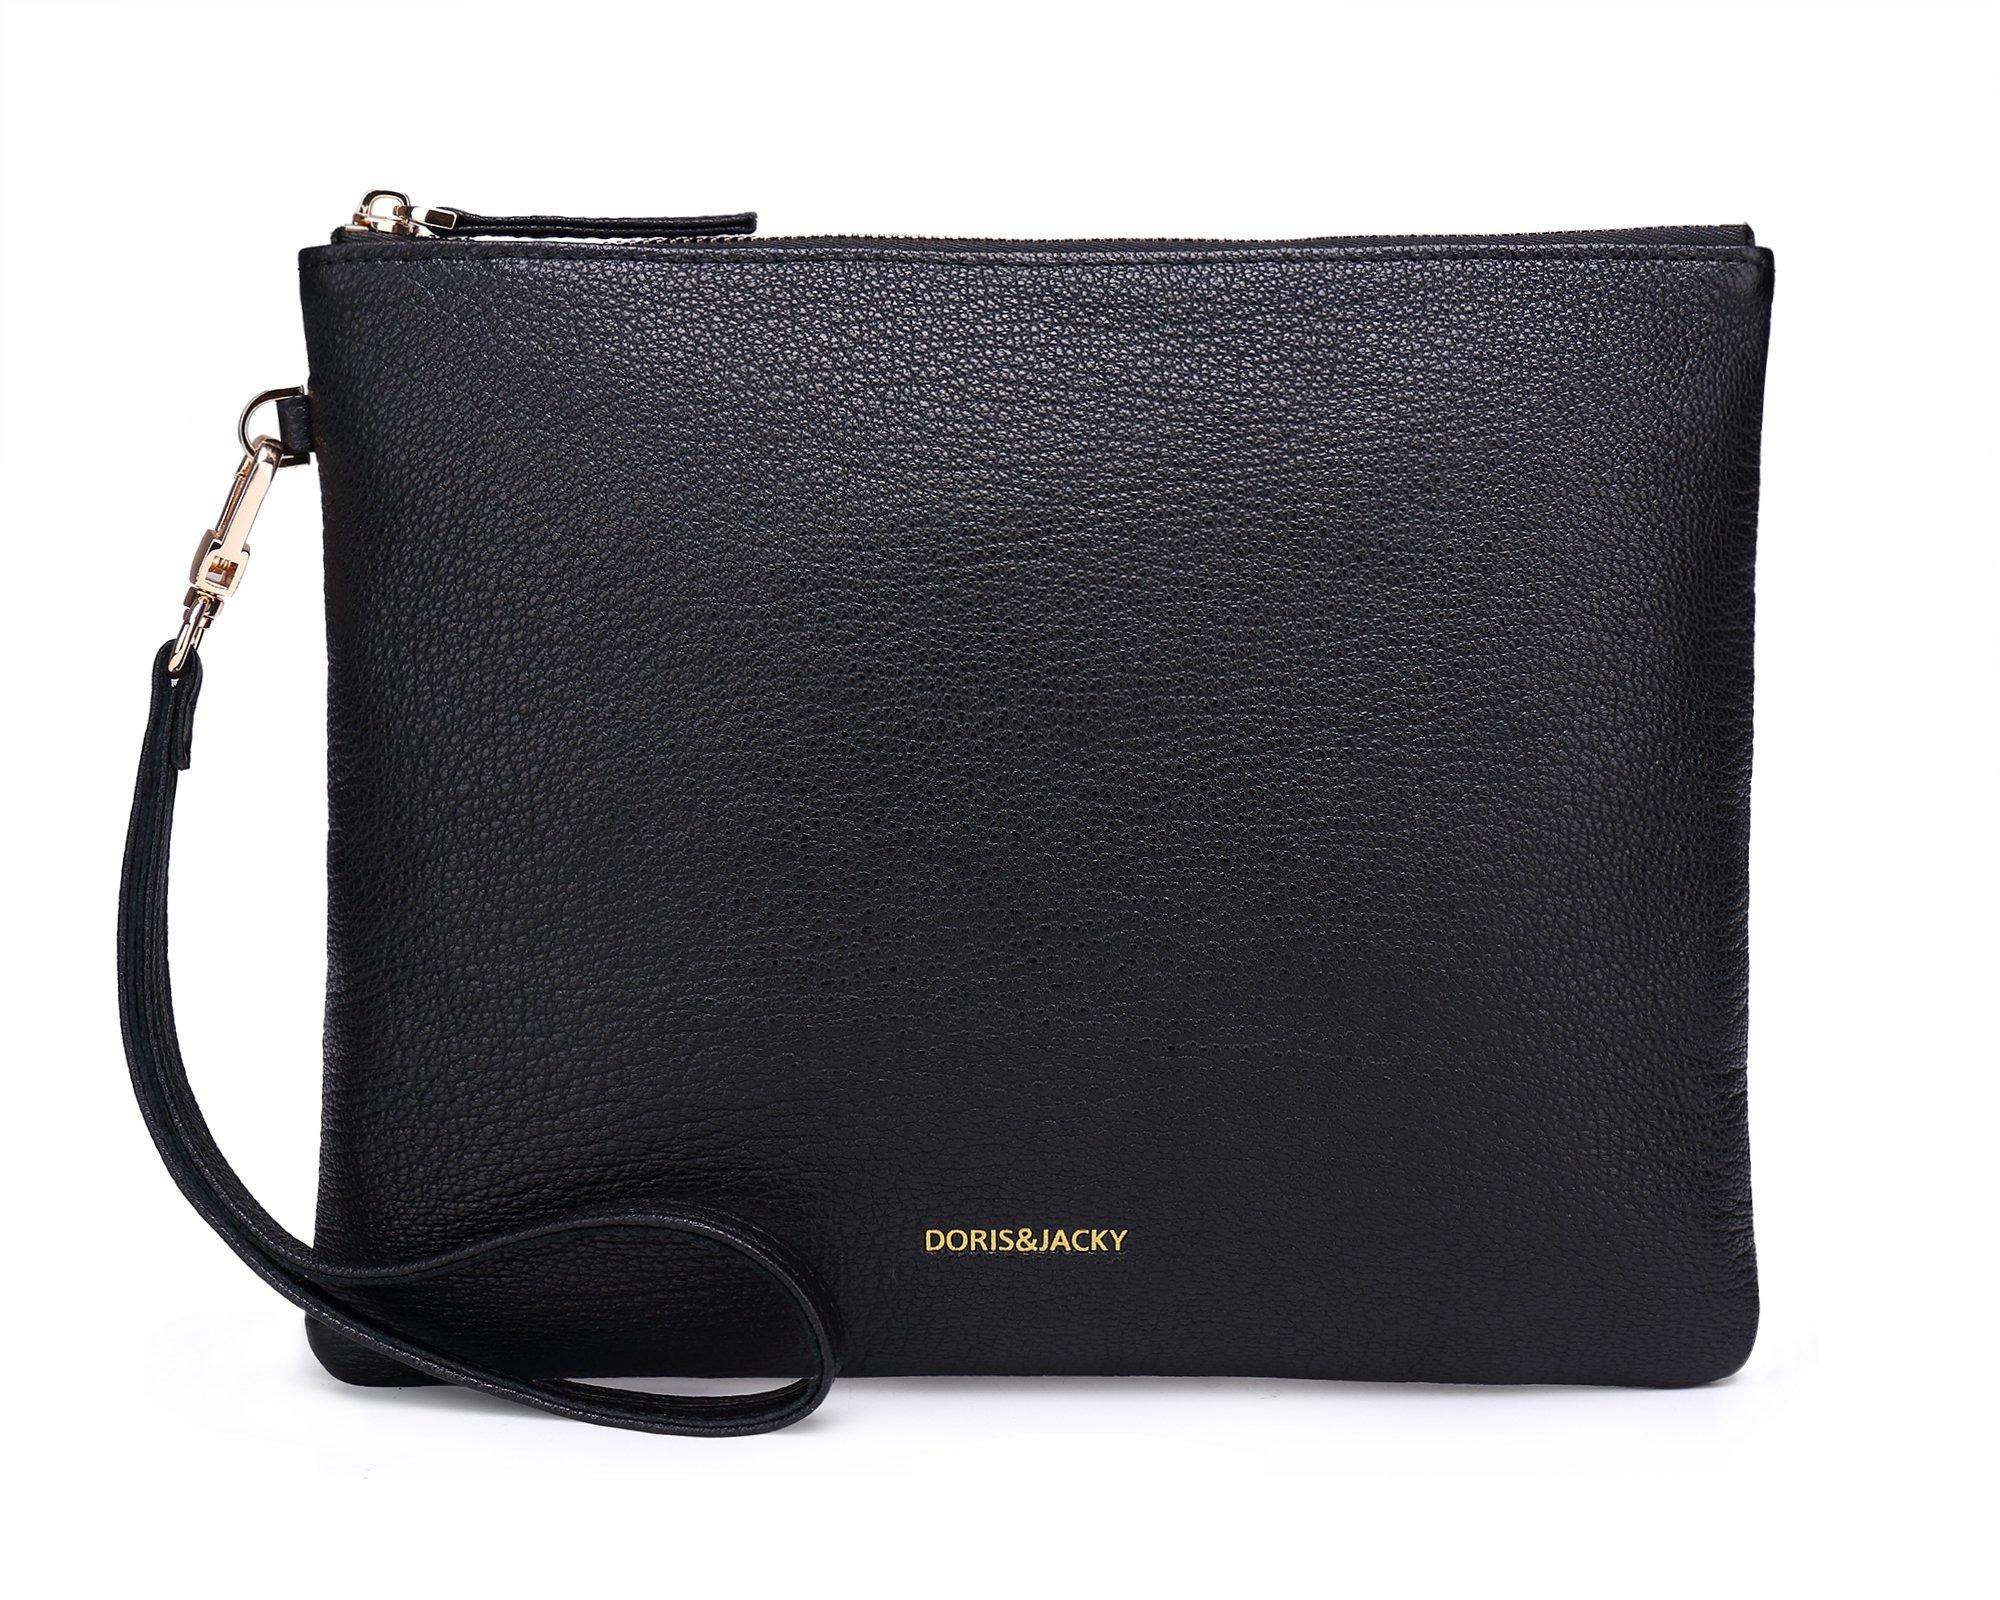 Soft Lambskin Leather Wristlet Clutch Bag For Women Designer Large Wallets With Strap (Black-Goat Leather)